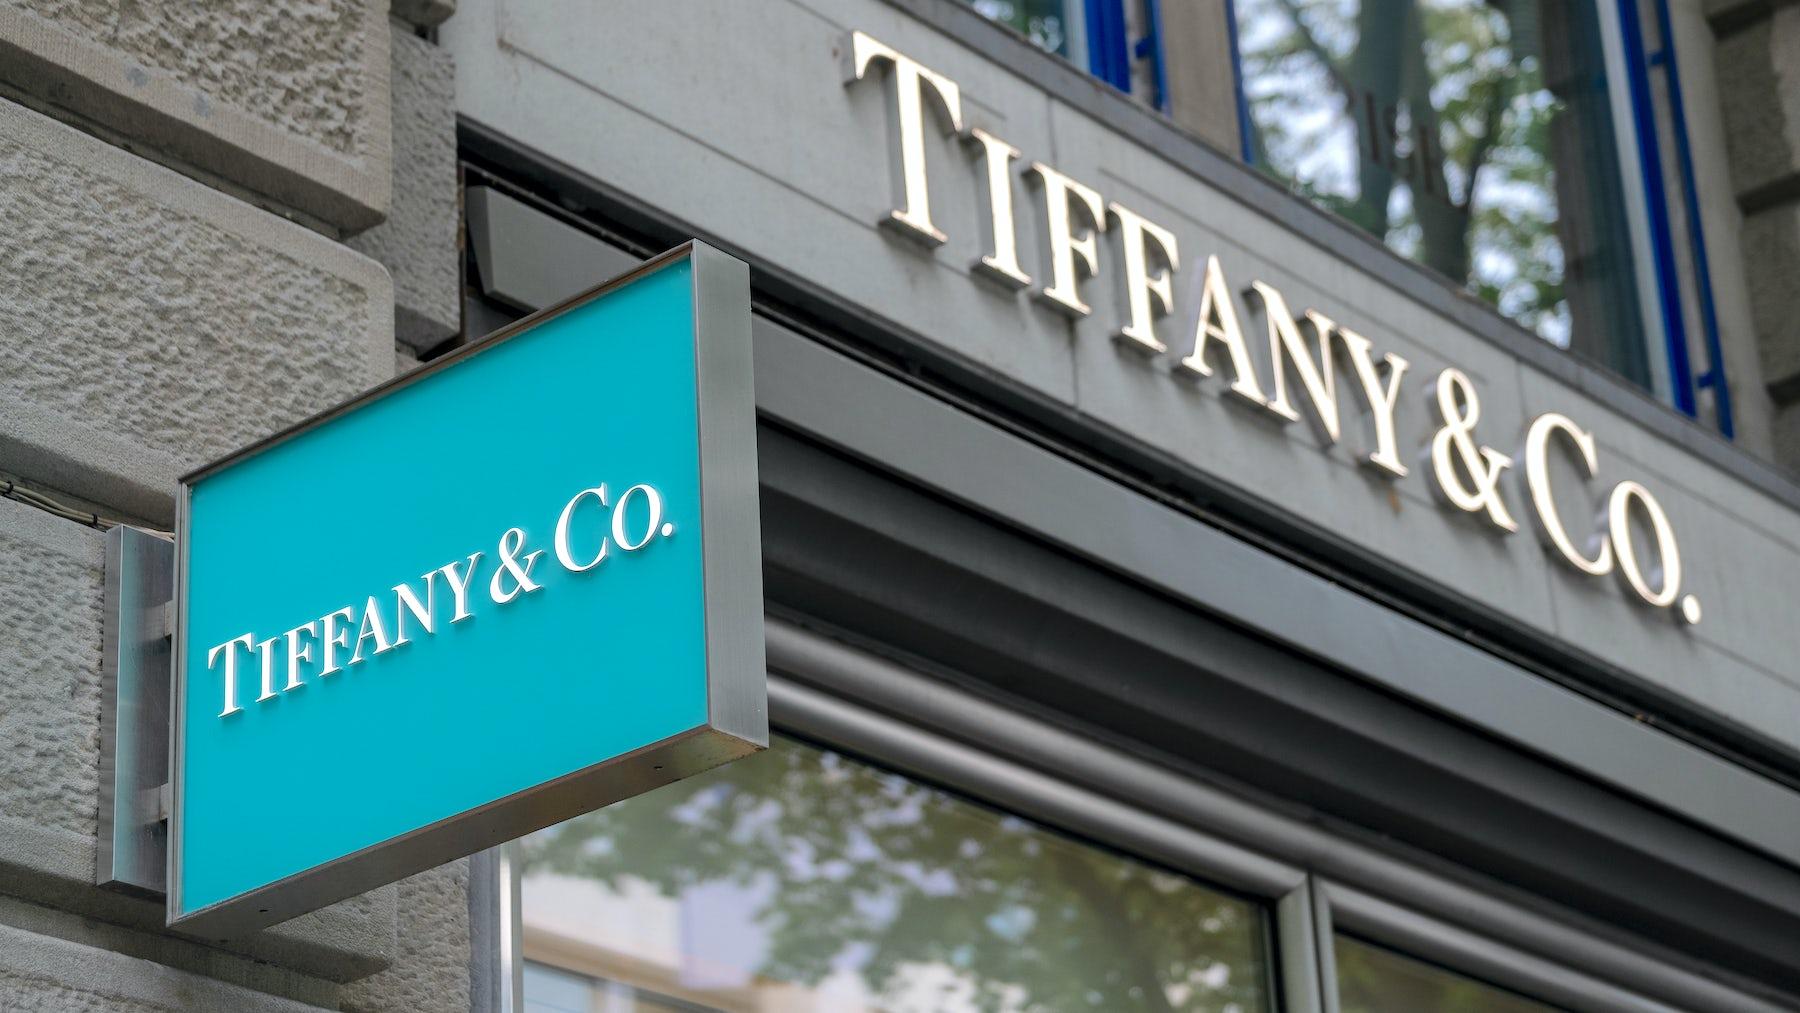 A Tiffany & Co. store in Zurich   Source: Shutterstock